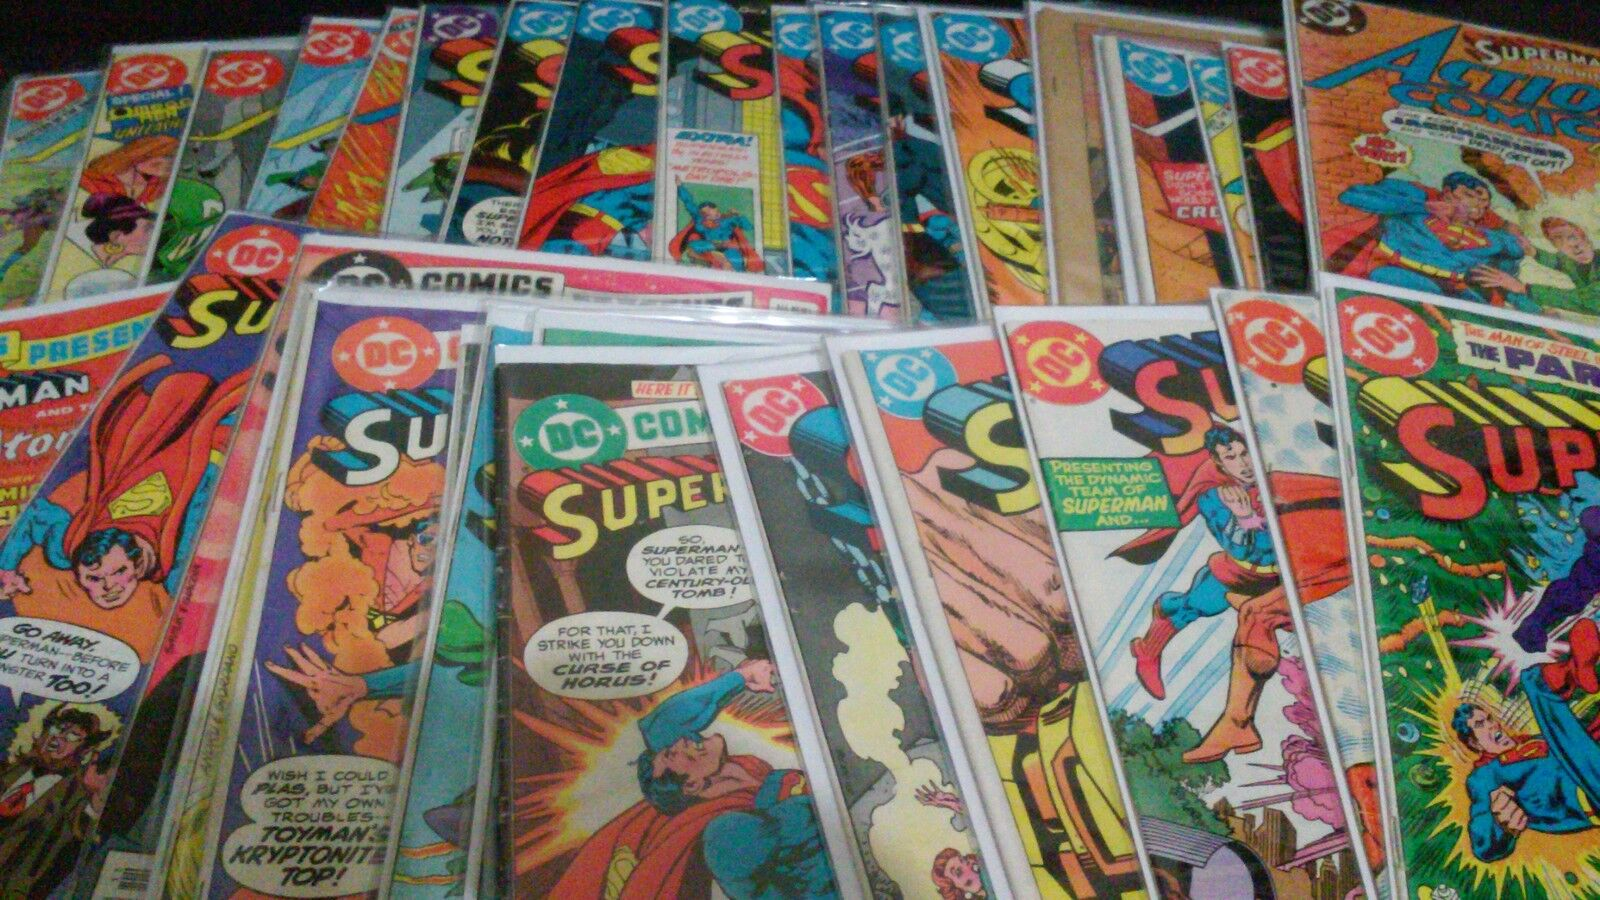 Mileco Imperial Comic Books